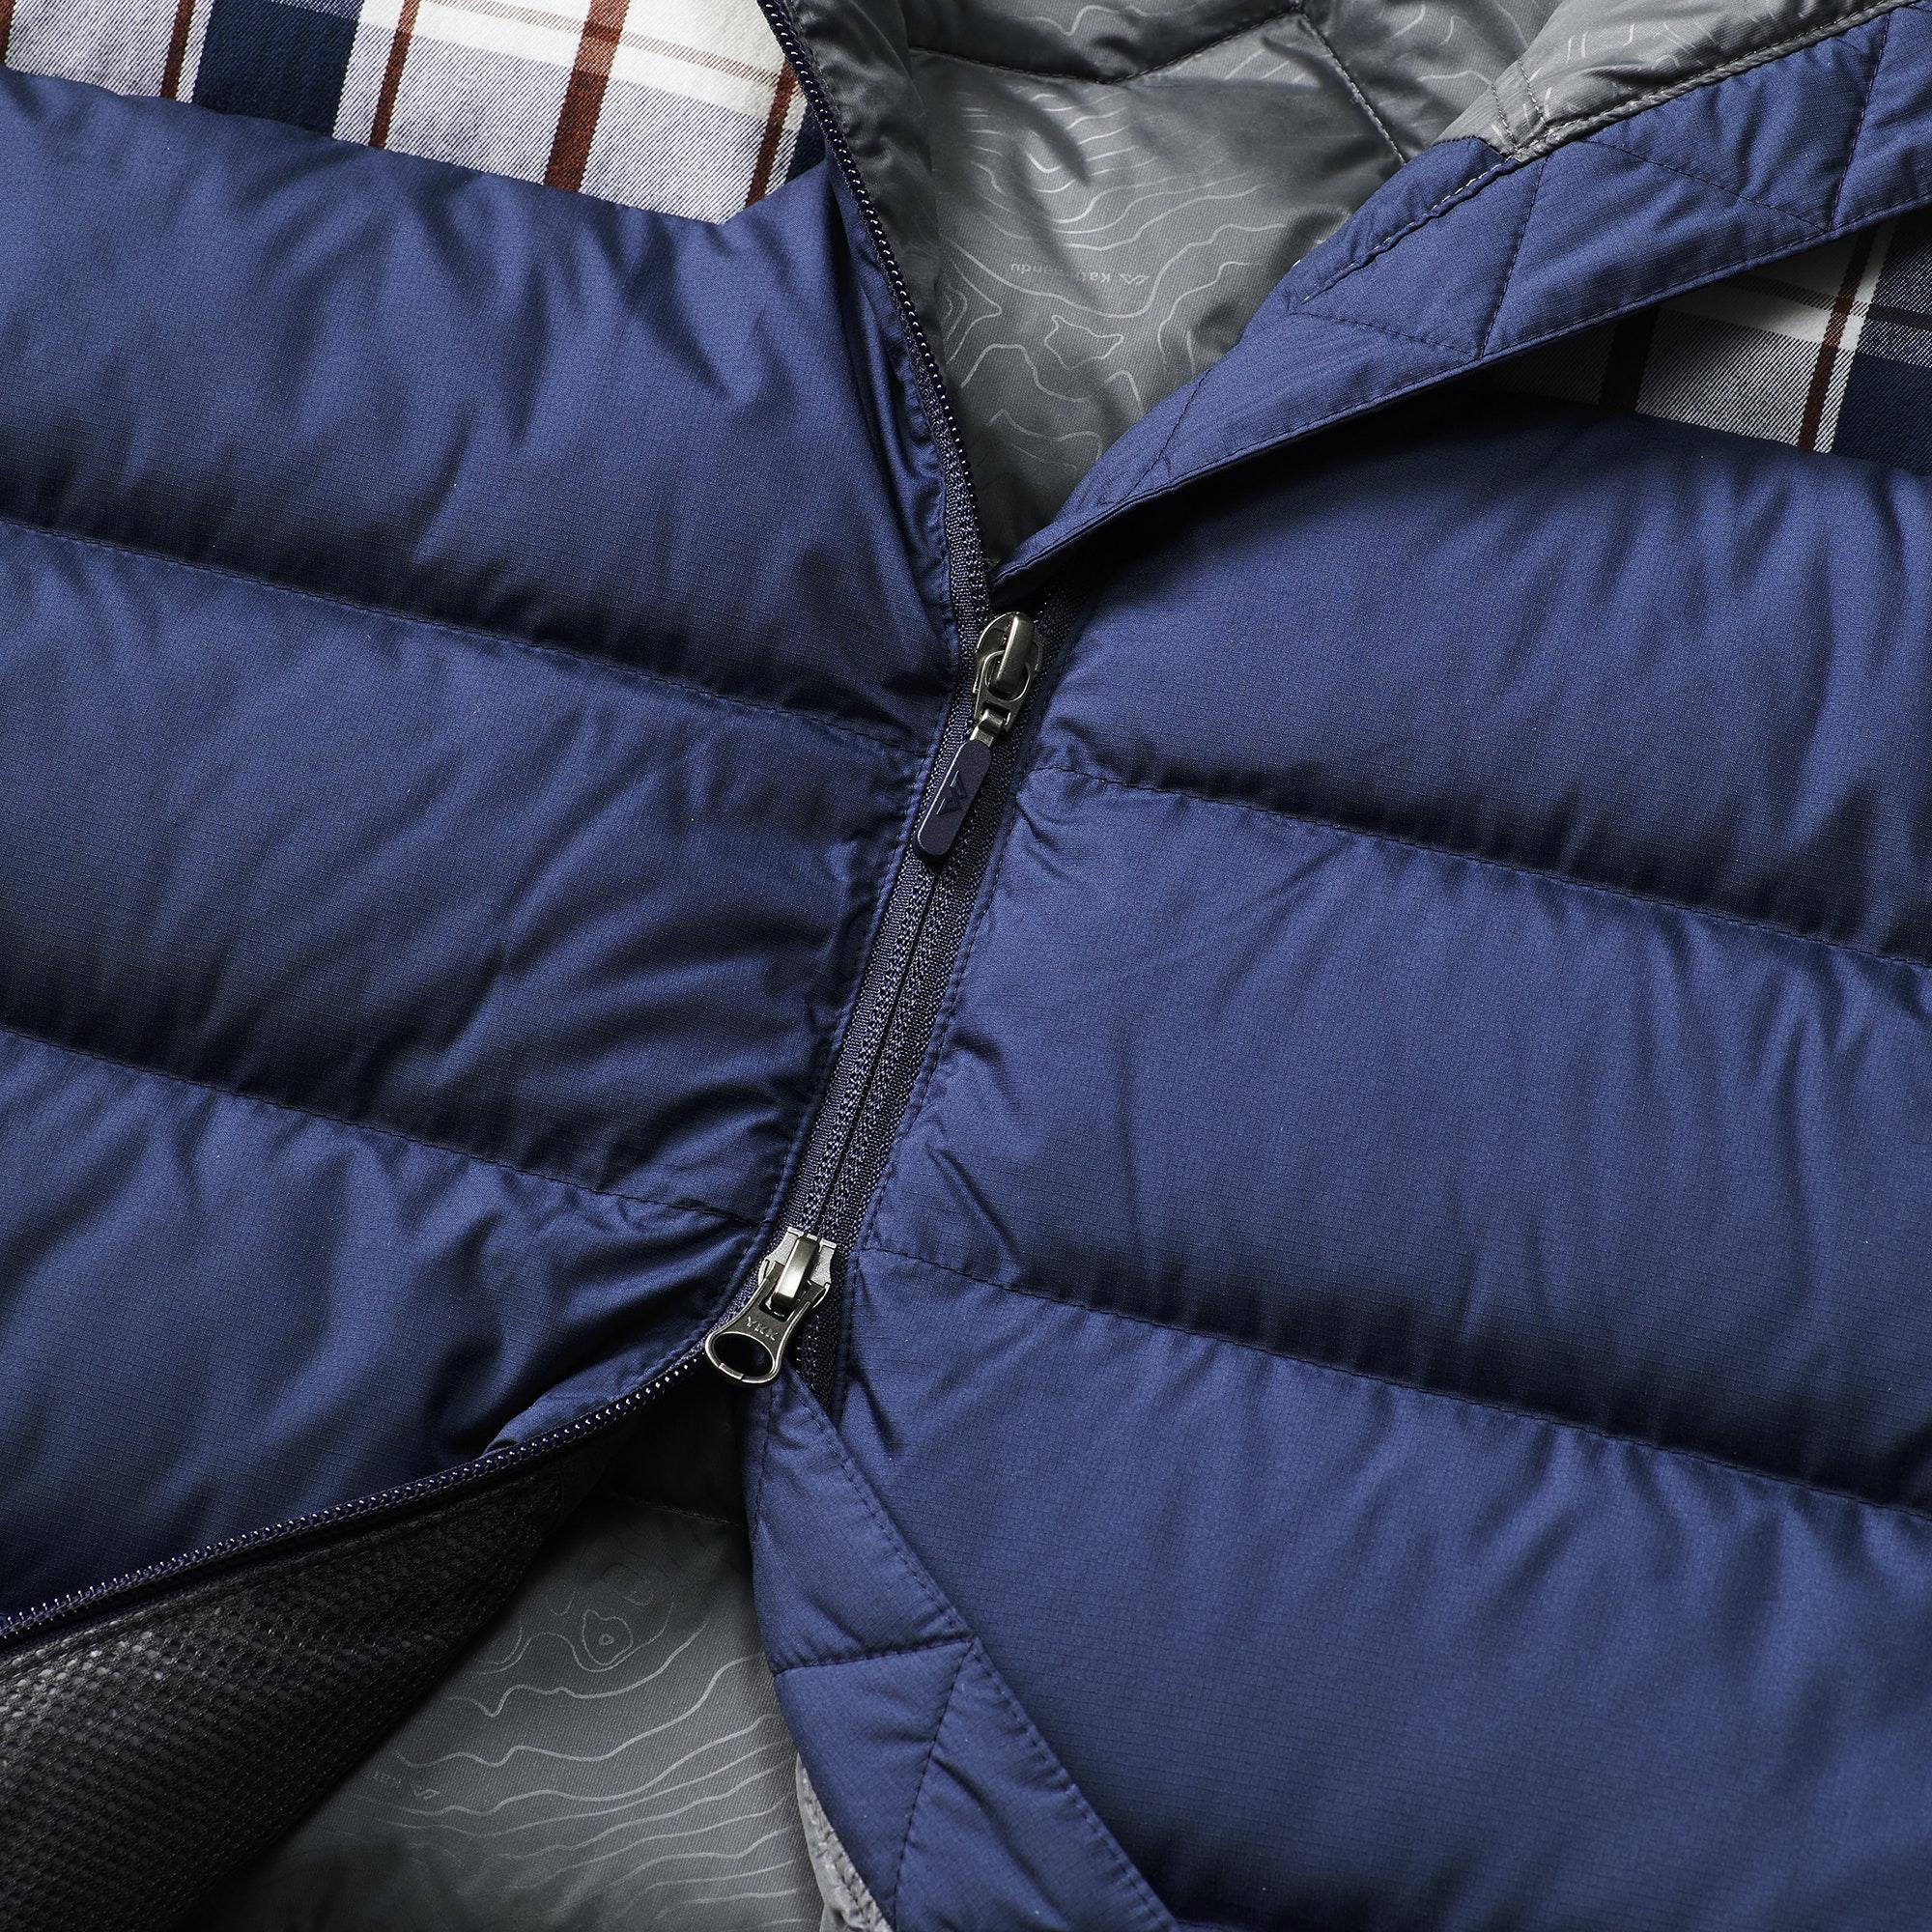 NEW-Kathmandu-Epiq-Men-039-s-Warm-Winter-Duck-Down-Puffer-Jacket-v2 thumbnail 23